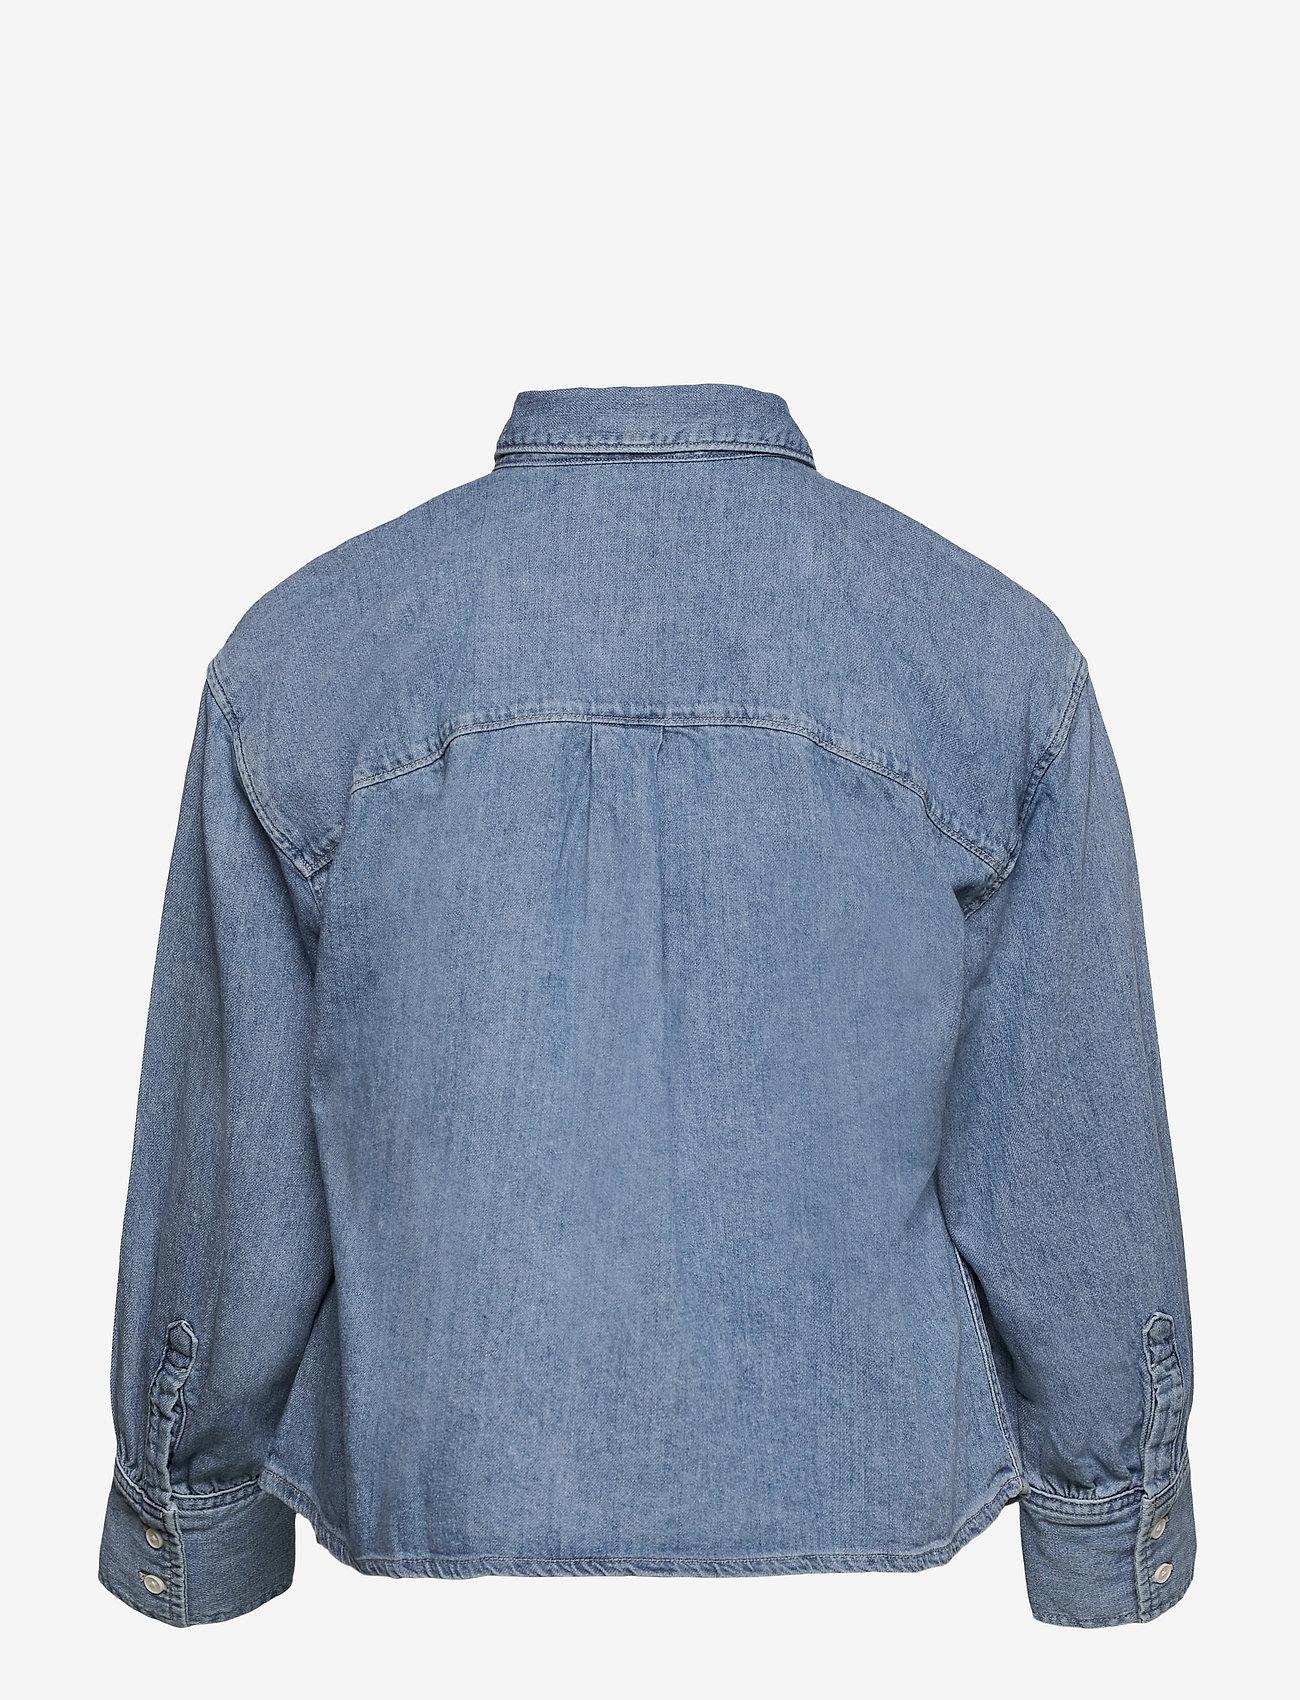 Levi's Plus Size - PL ZOEY PLEAT UTLTY SHRT STAY - jeansblouses - med indigo - flat finish - 1